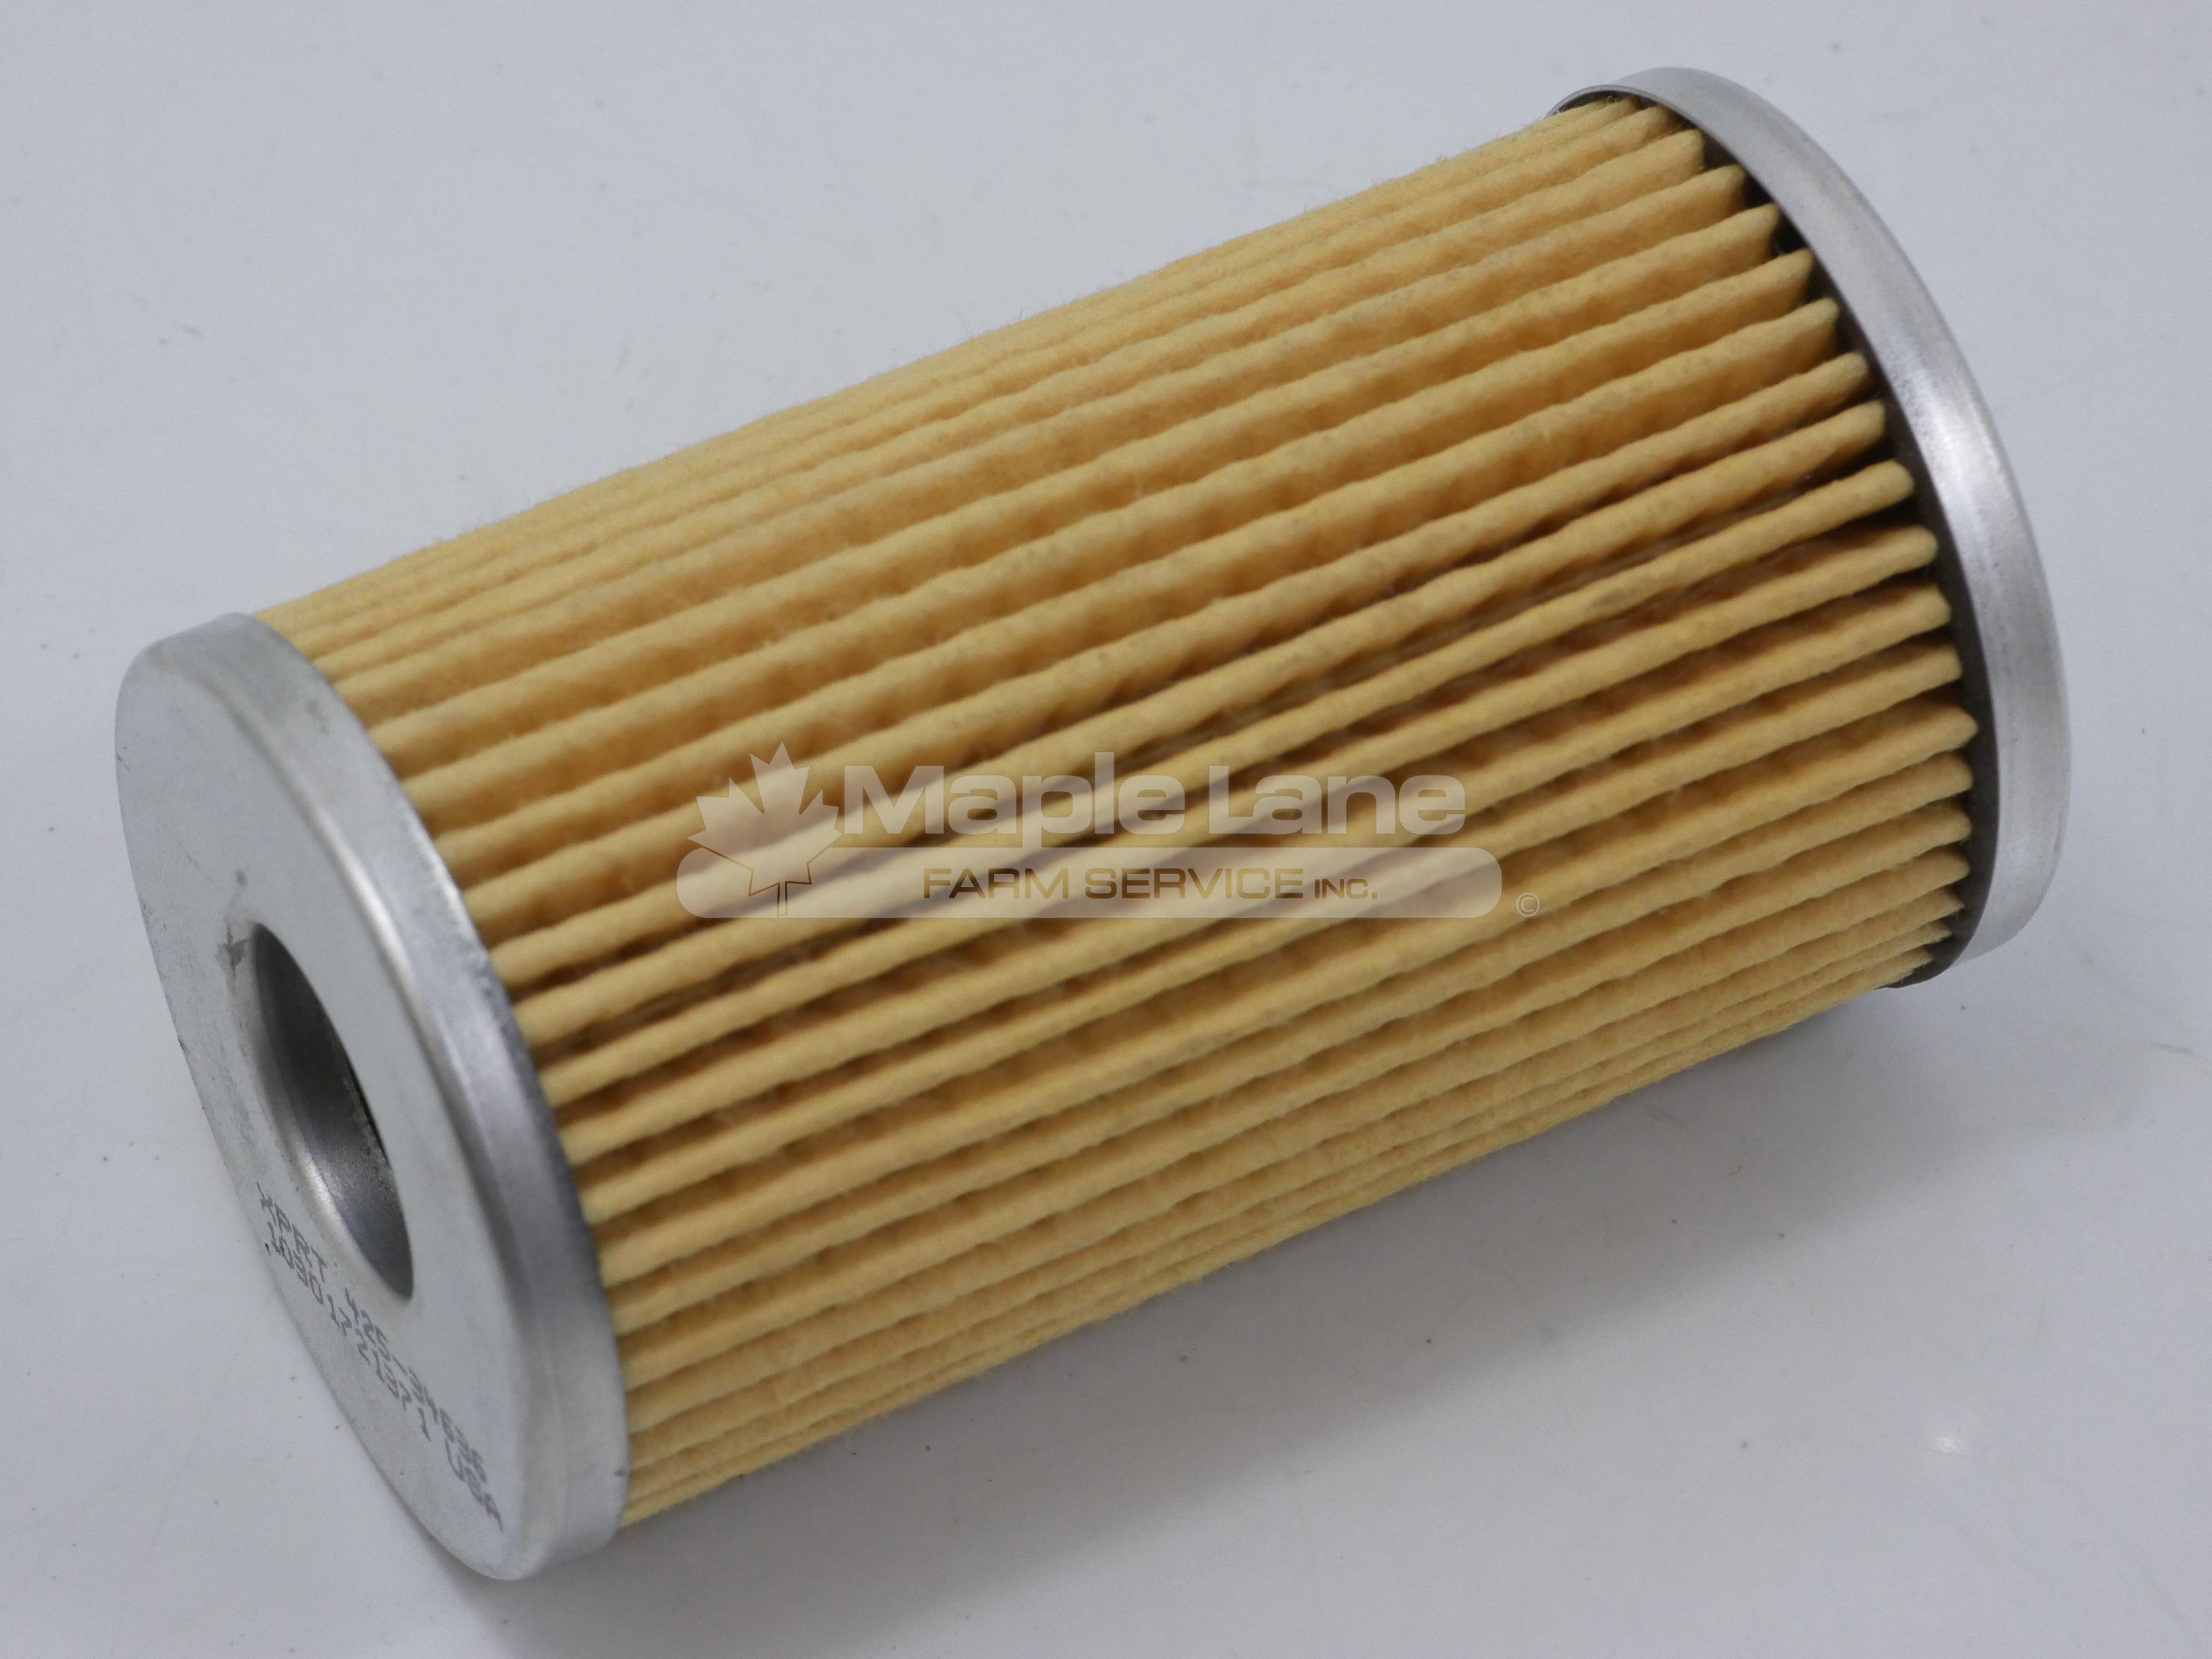 425-34636 Fuel Oil Element